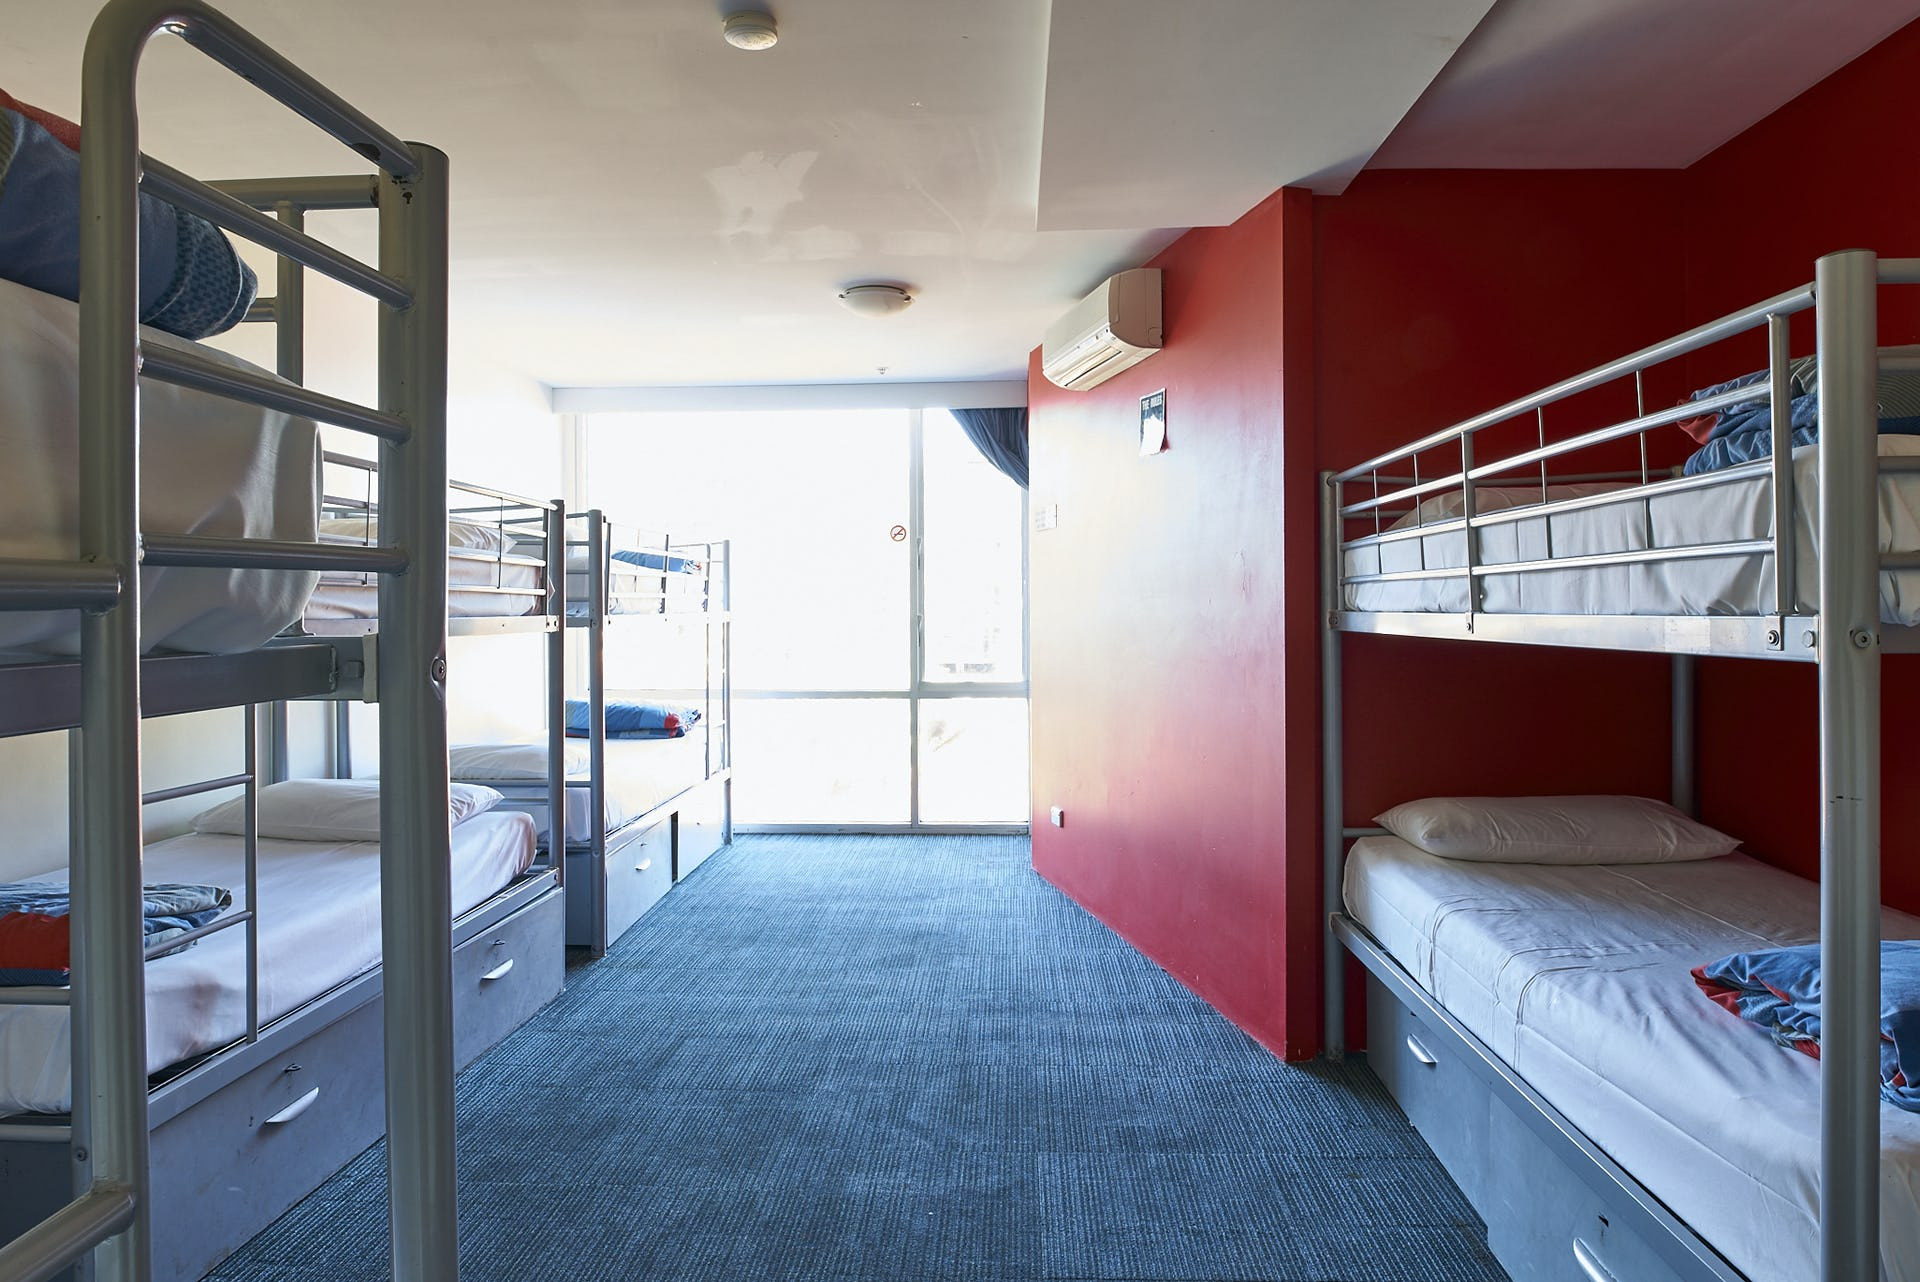 Base墨尔本背包客旅馆的10床套房